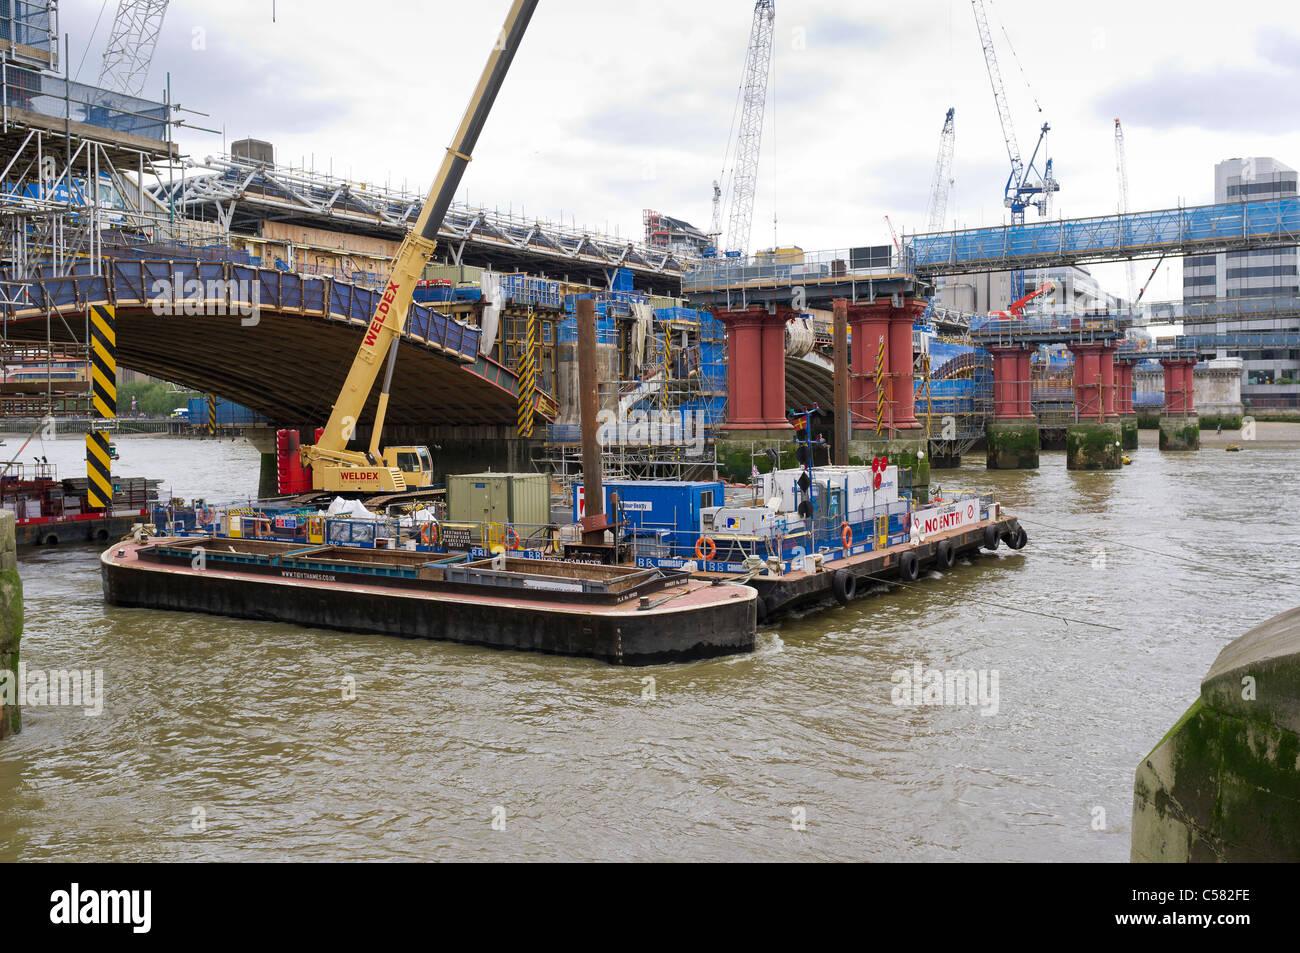 Blackfriars Station Rebuild across Blackfriars Railway Bridge, London, Britain - May 2011 - Stock Image